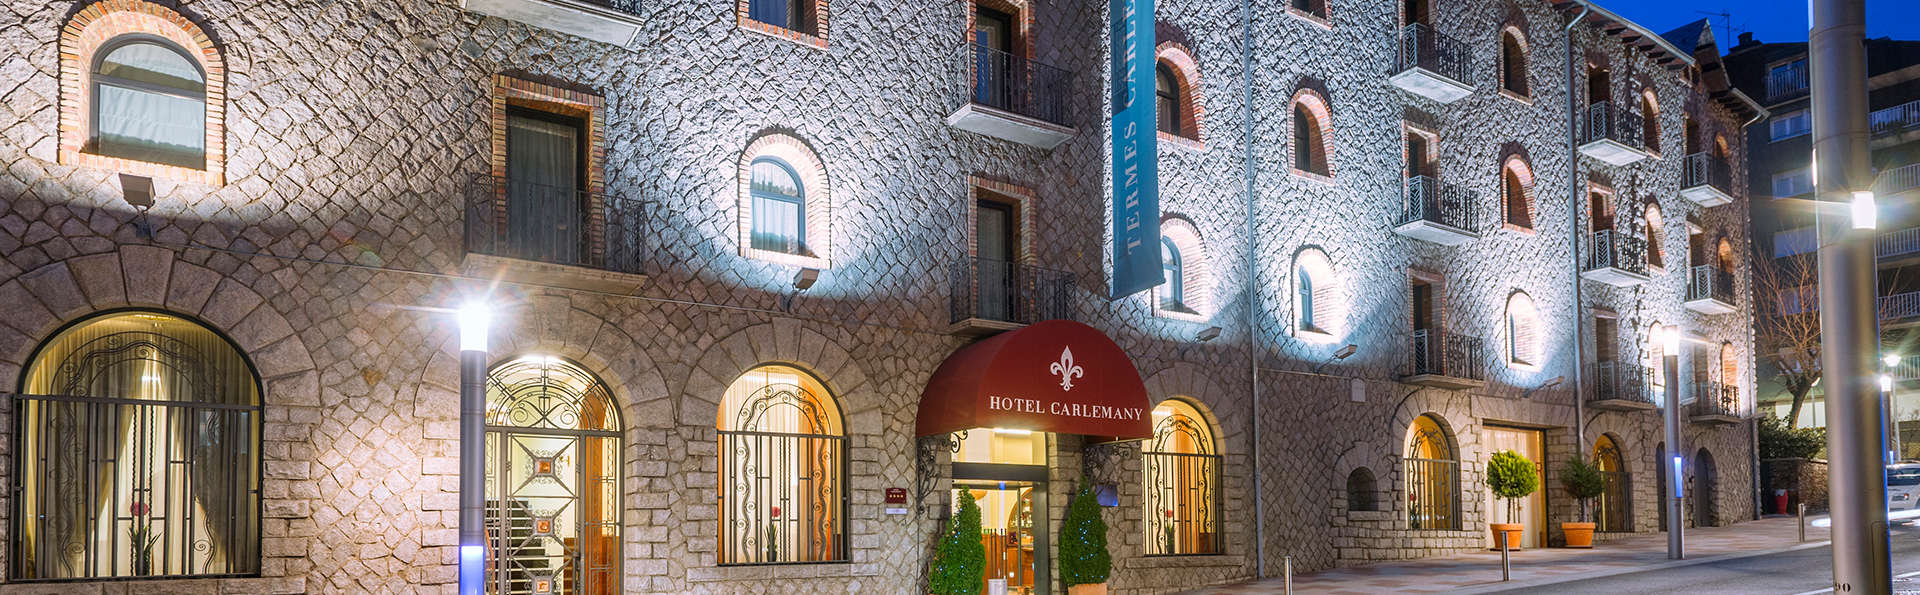 Hotel Spa Termes SERHS Carlemany - edit_fachada.jpg